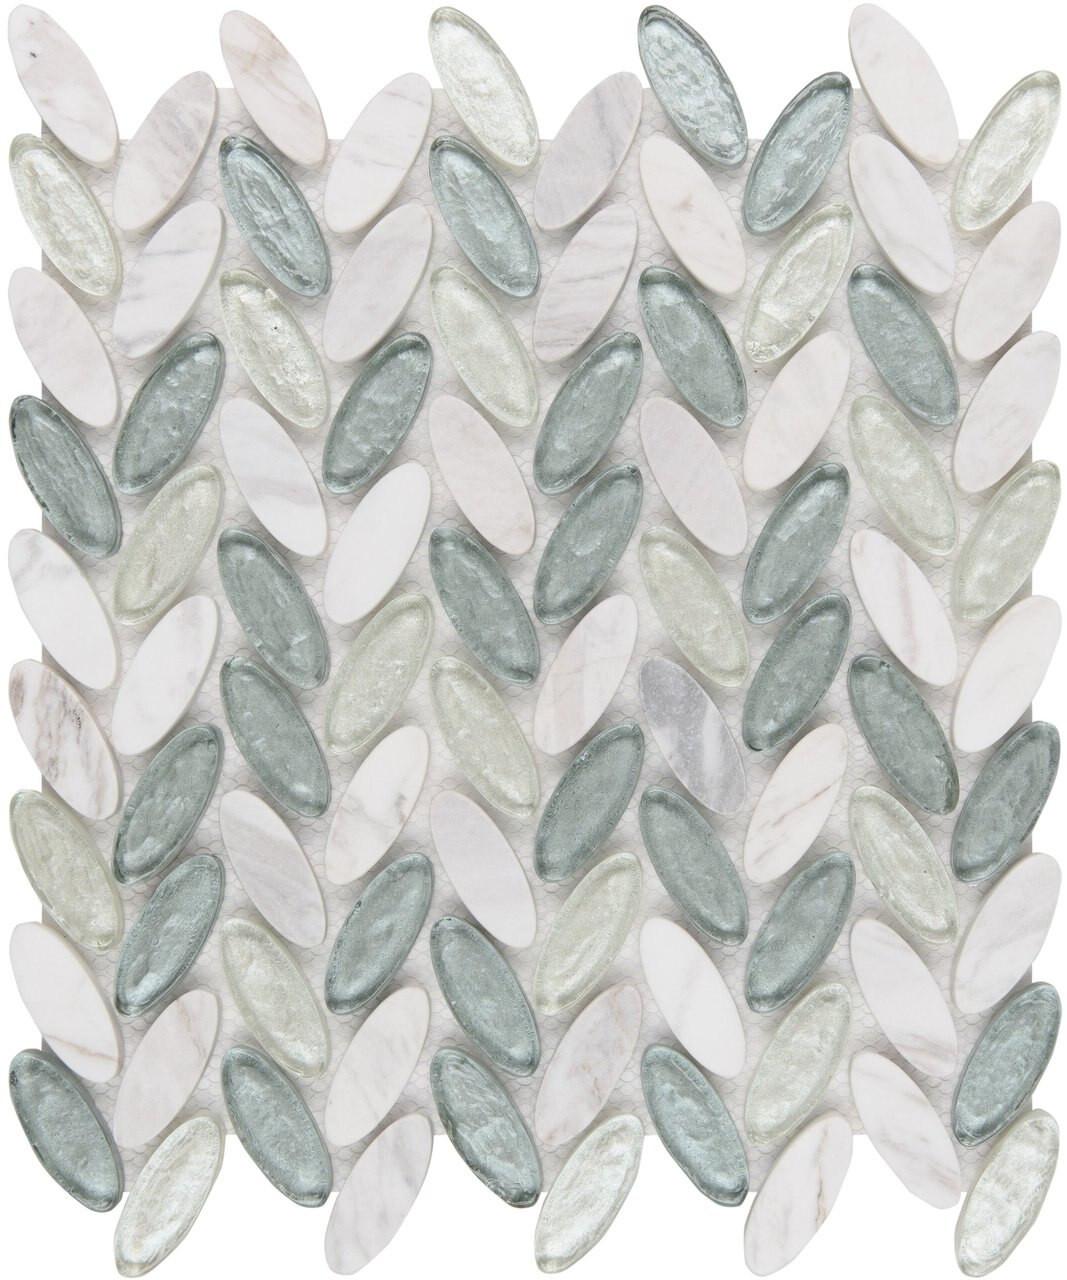 UBC Elyptic Herringbone Tile Morningside